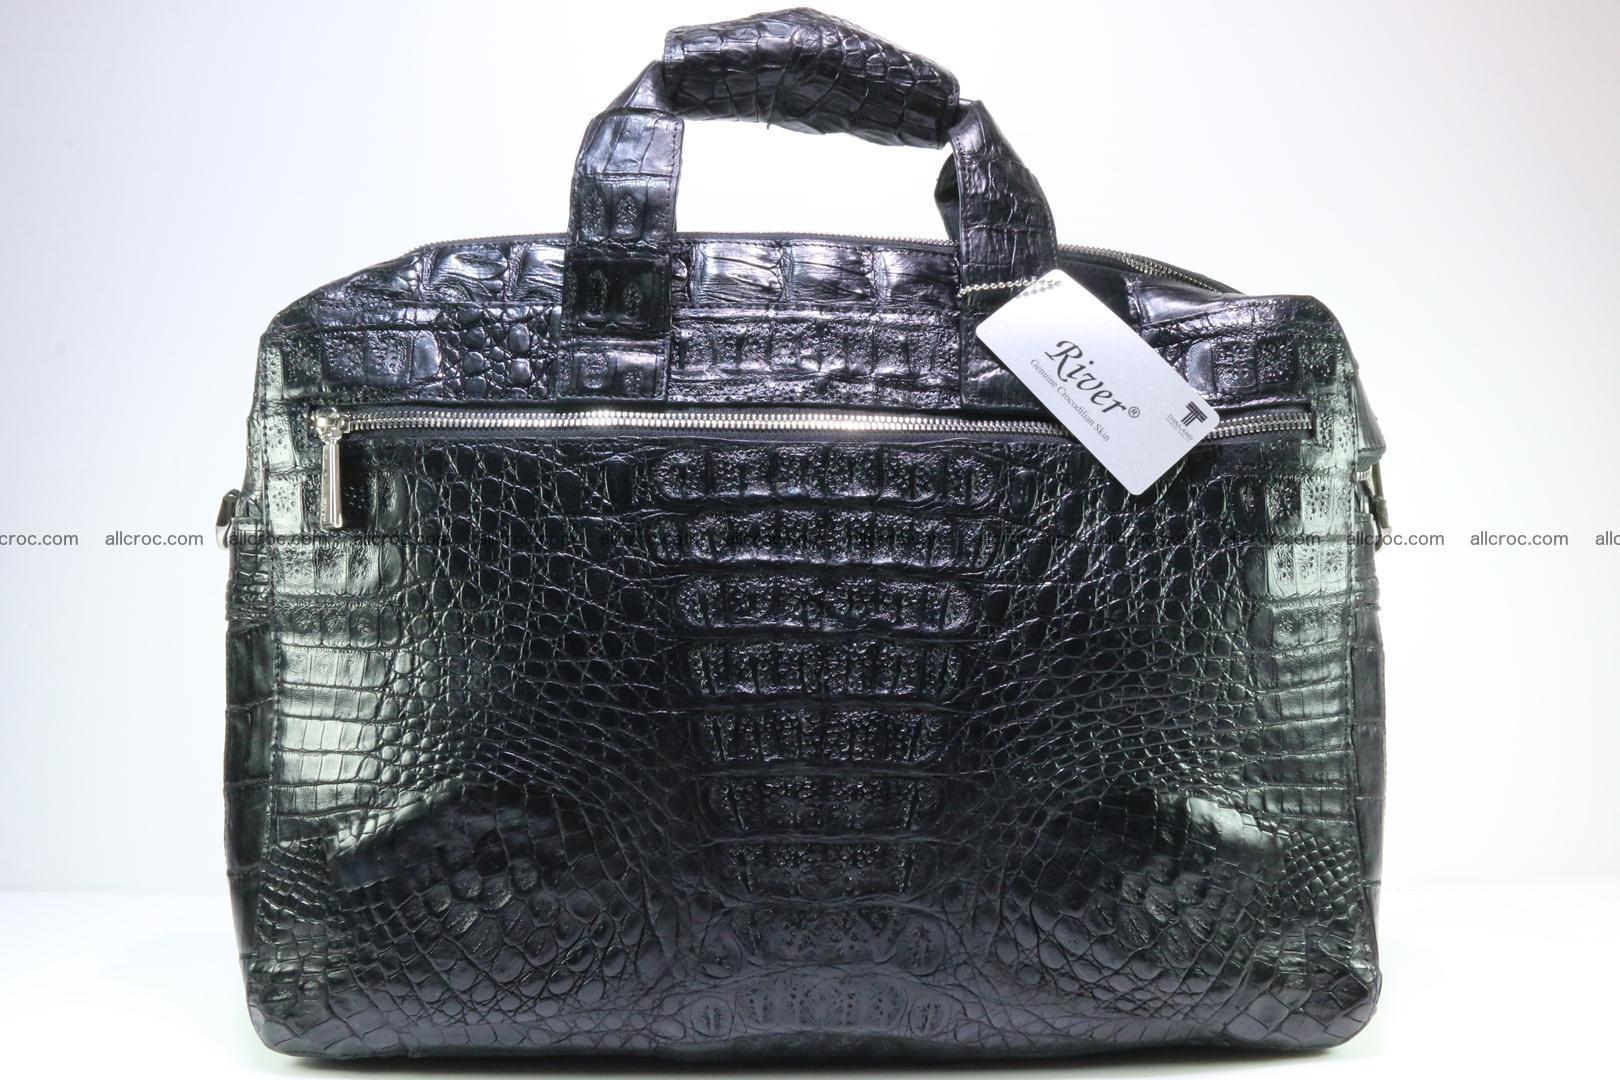 Crocodile skin handbag 127 Foto 1